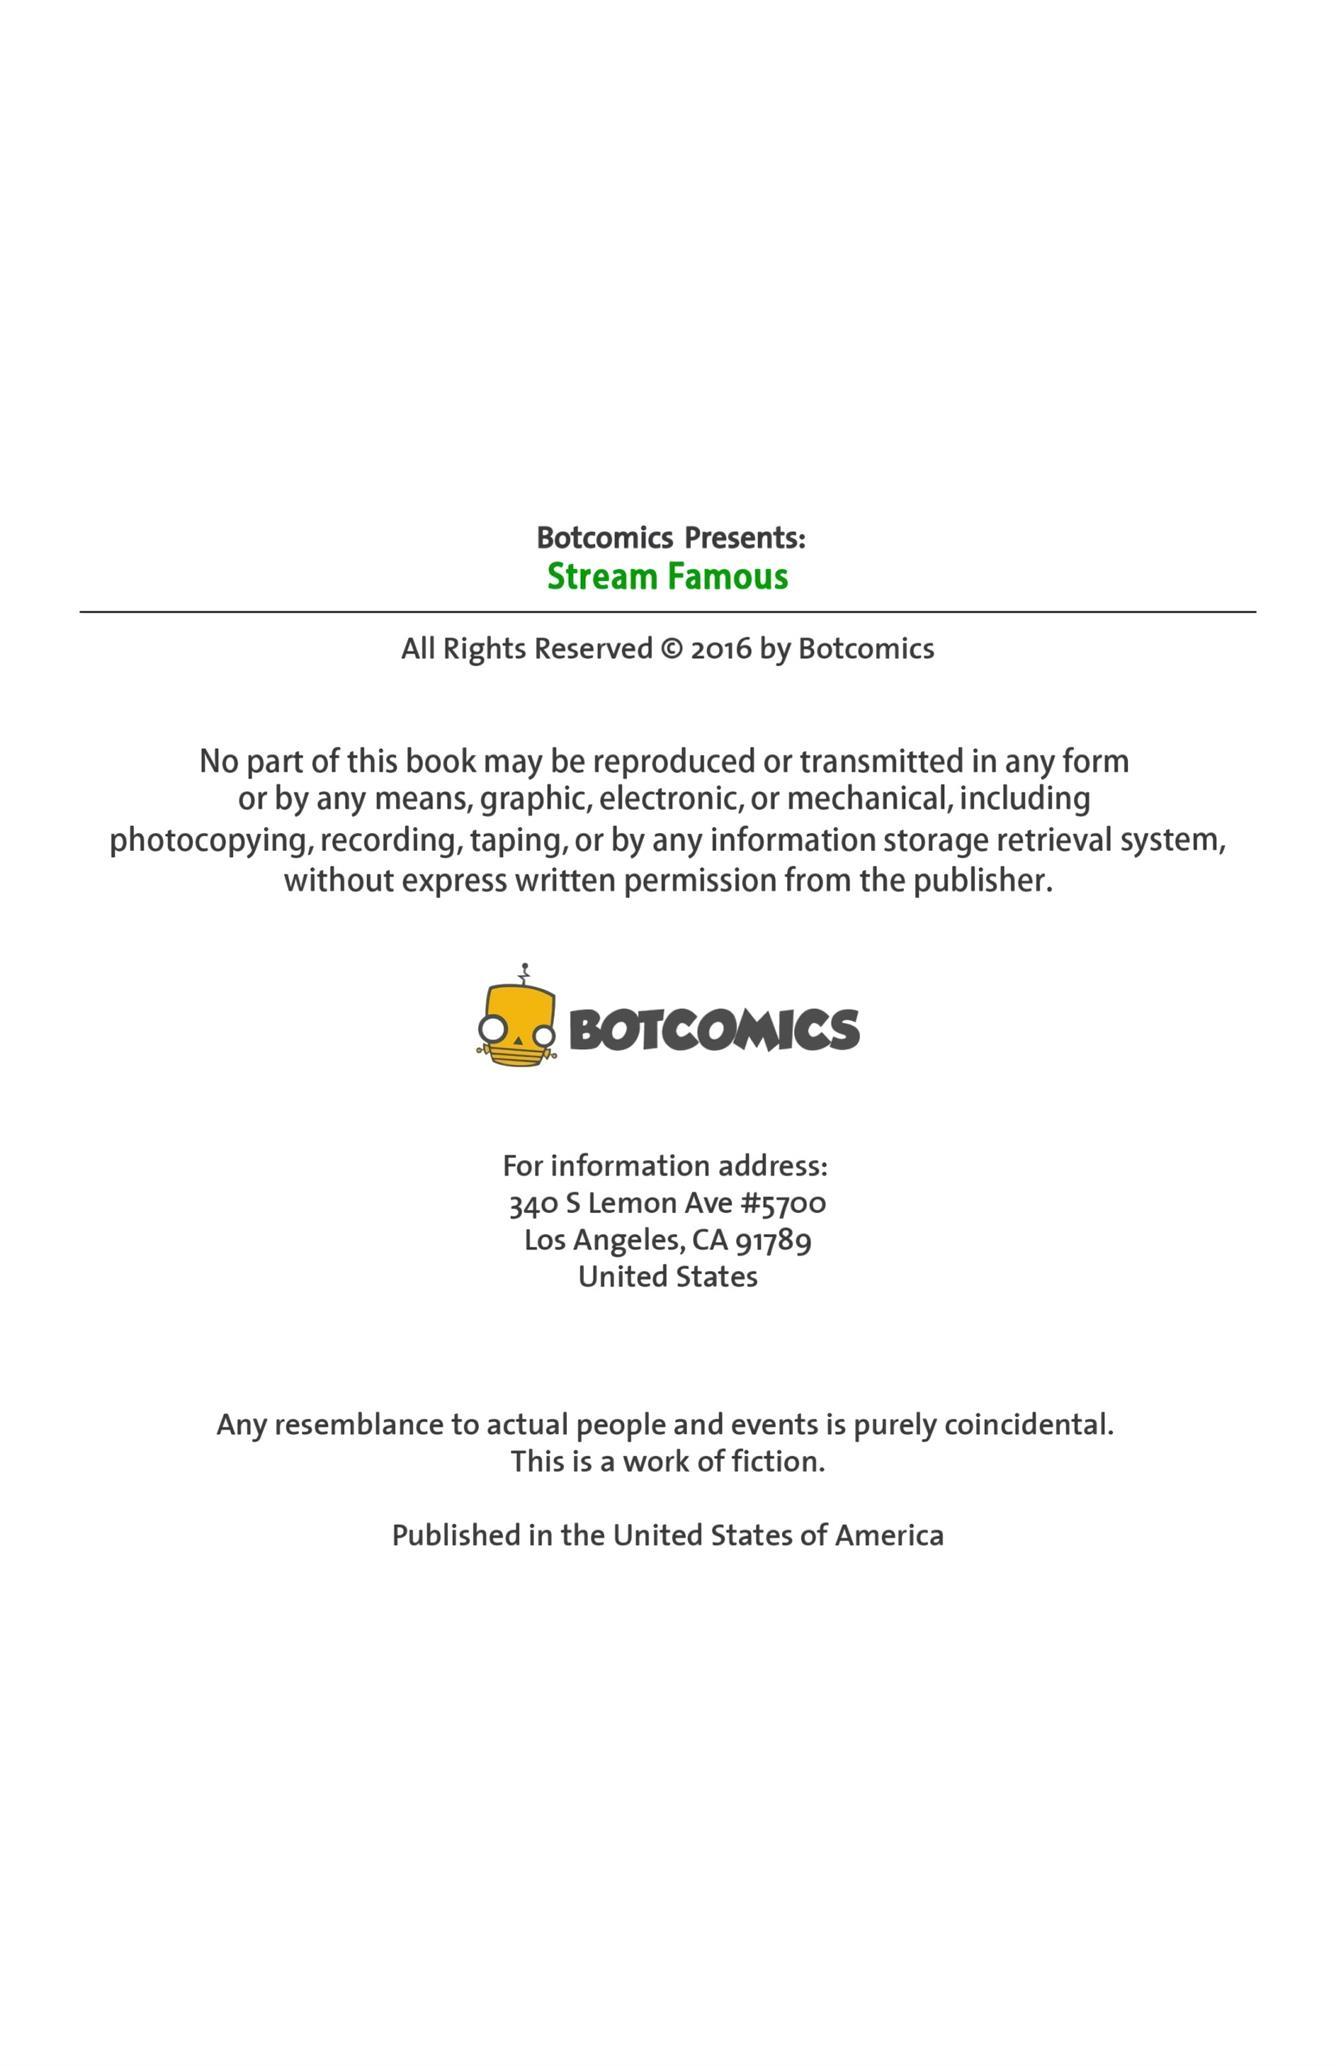 Stream Famous Issue 1 [BotComix] - Foto 2